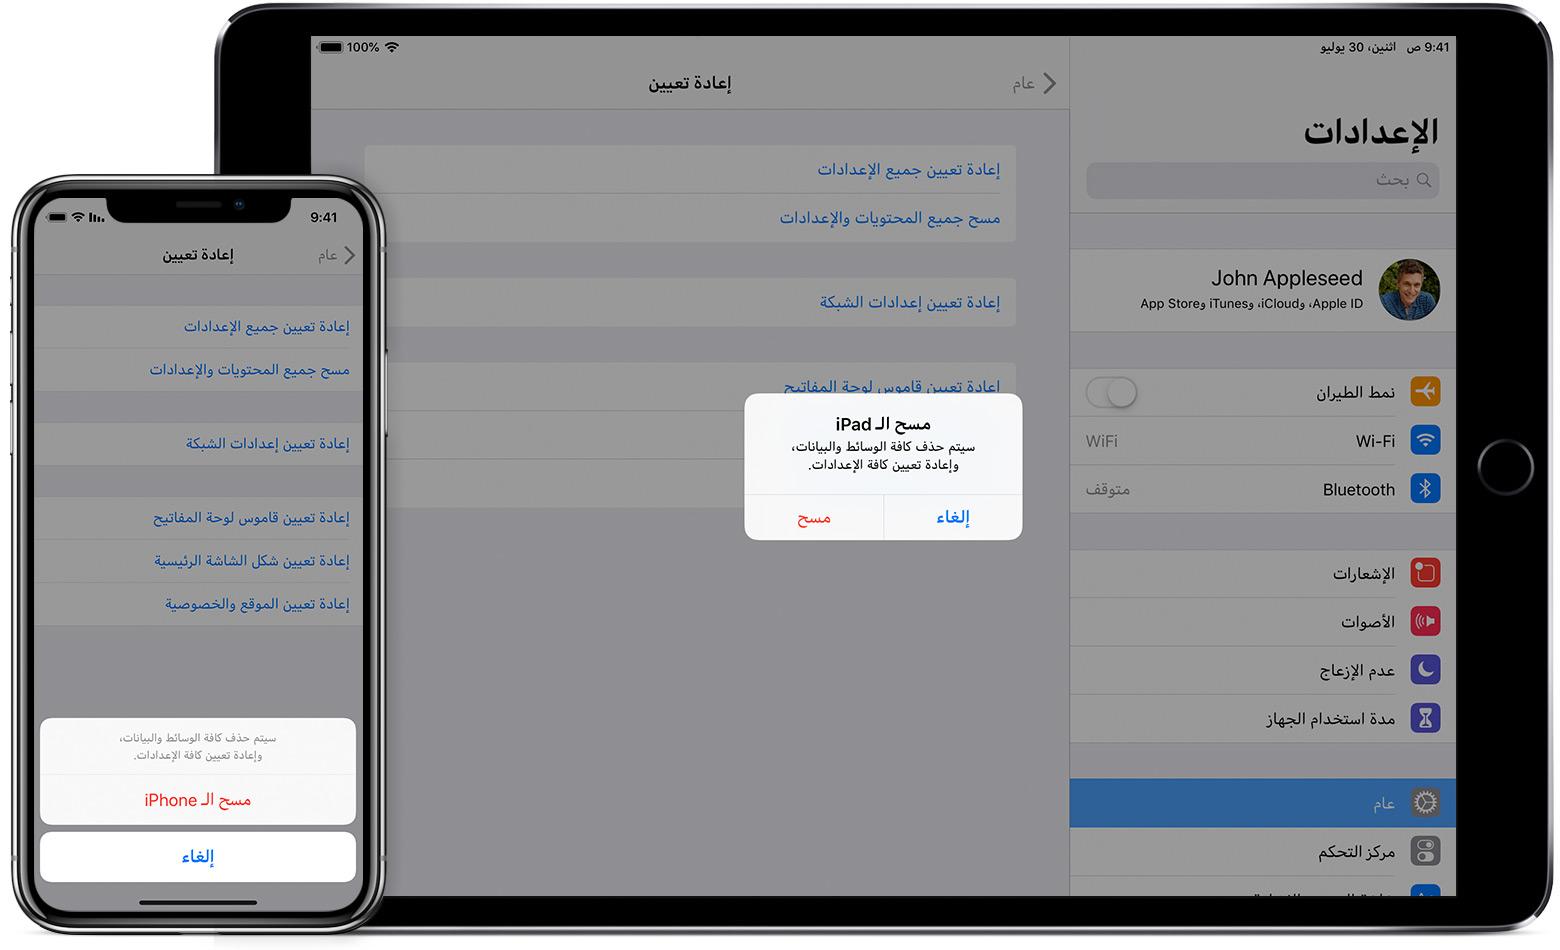 3c49b998ff28c ما ينبغي عليك القيام به قبل بيع iPhone أو iPad أو iPod touch أو ...